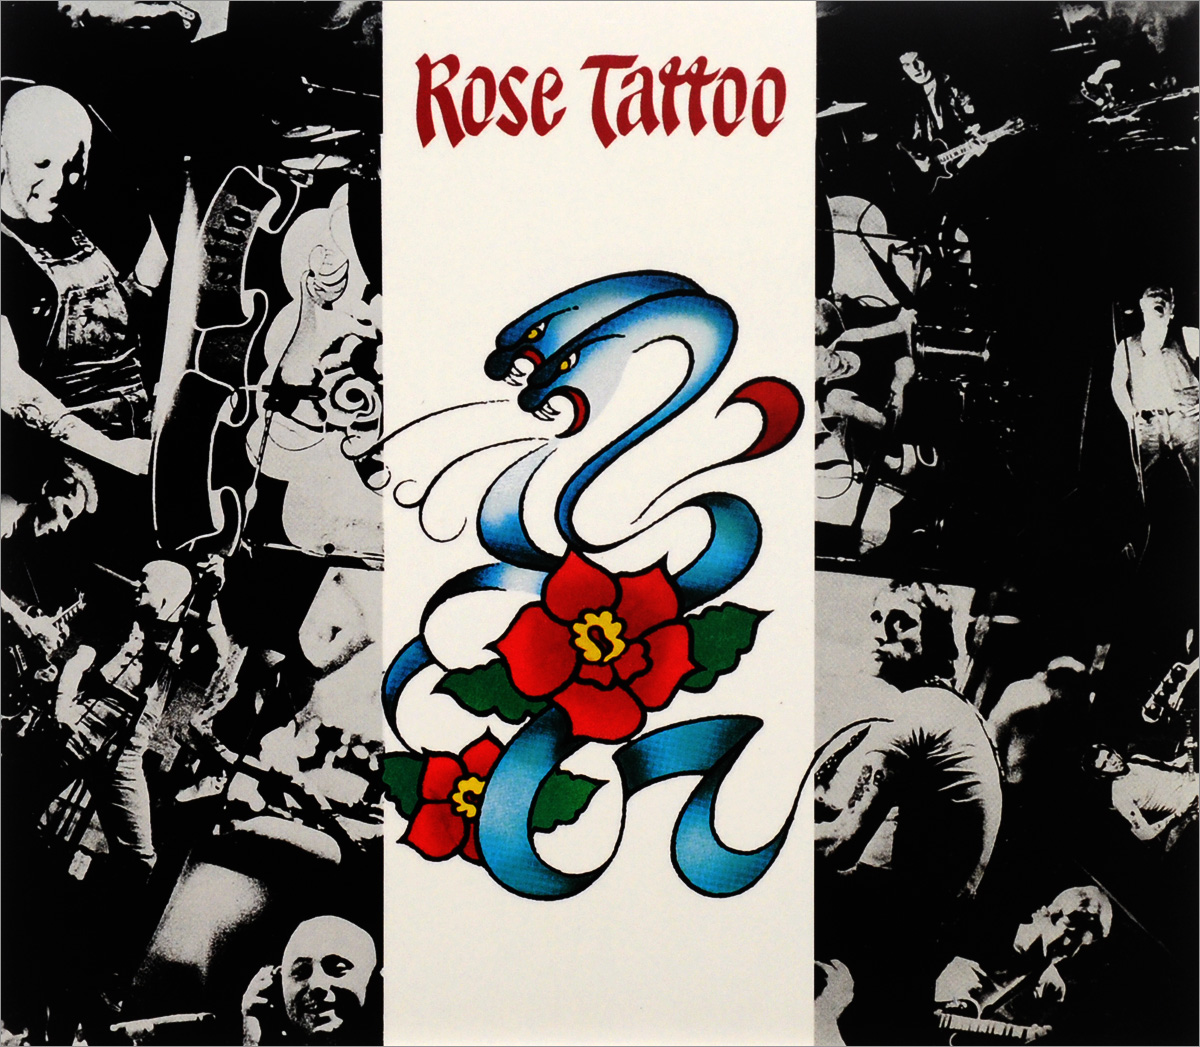 Rose Tattoo Rose Tattoo. Rose Tattoo rose